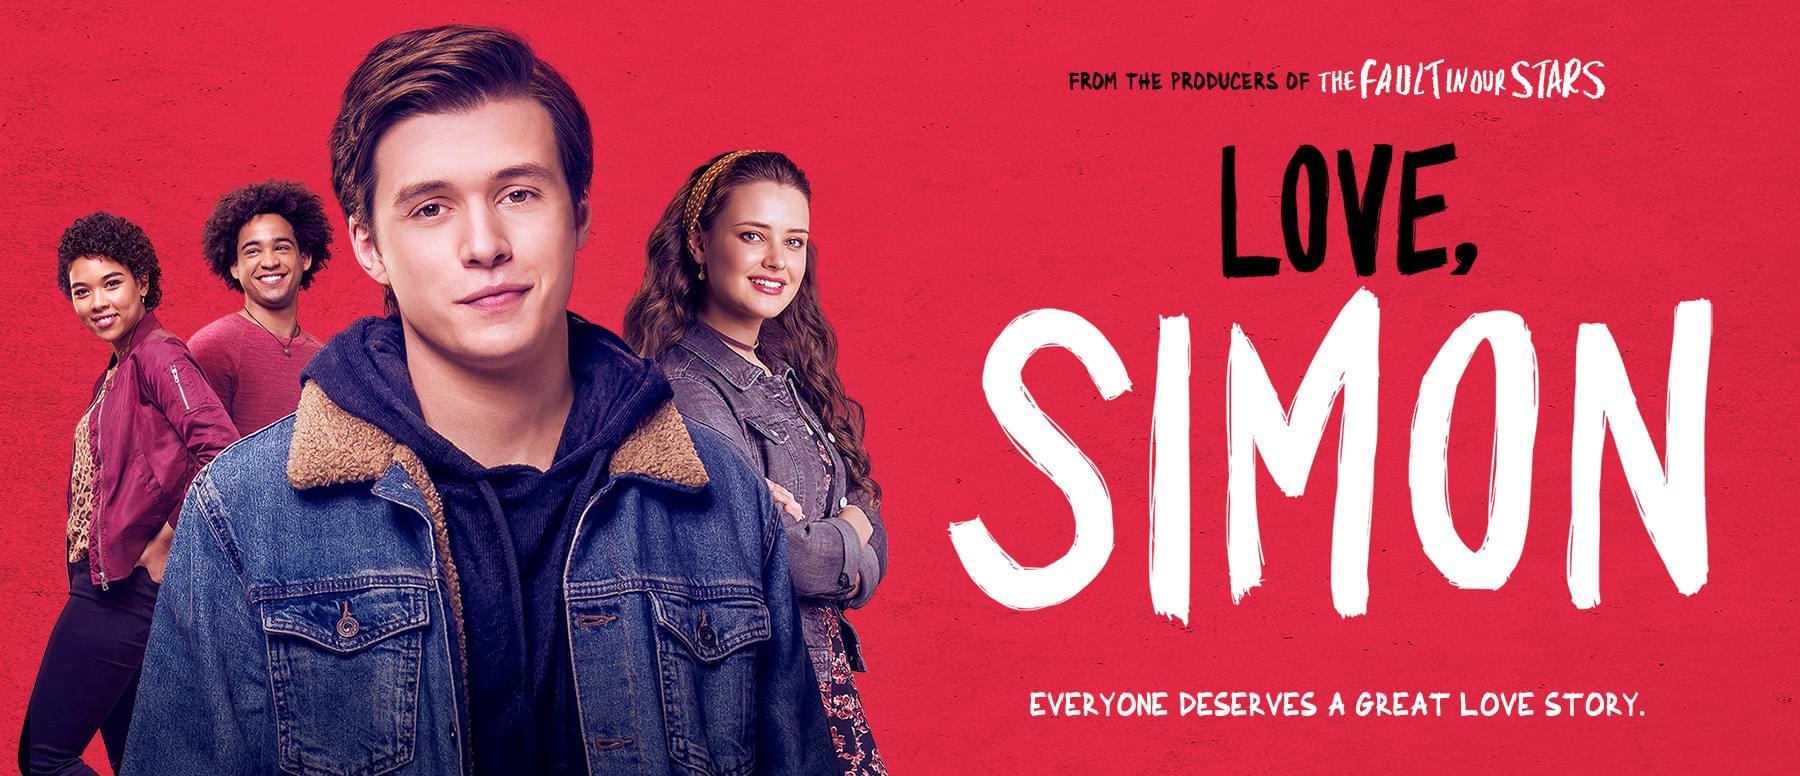 Movies That Matter Film Series; Love, Simon